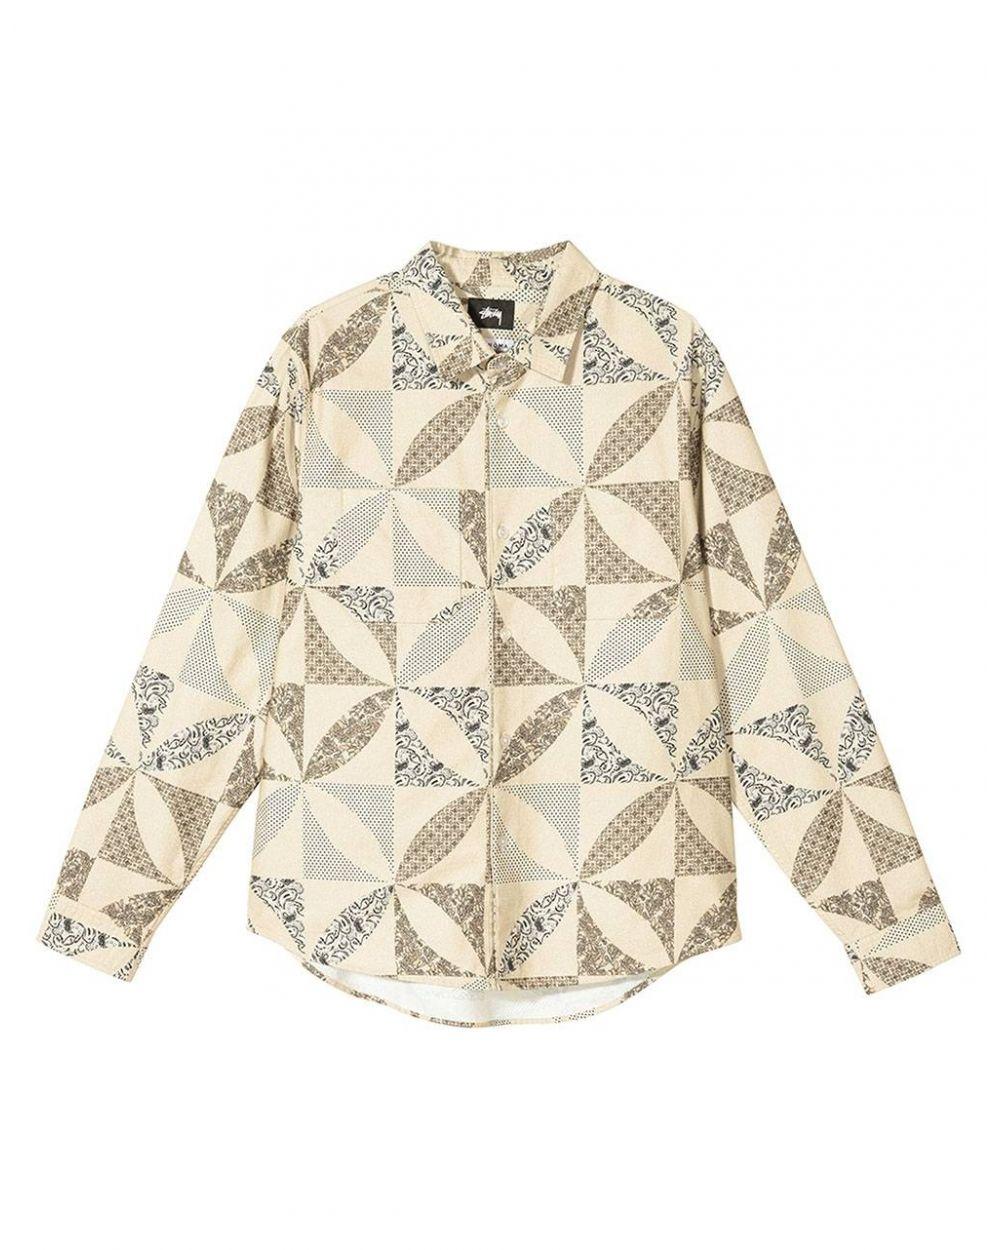 Stussy quilt pattern shirt - sand Stussy Shirt 146,72€